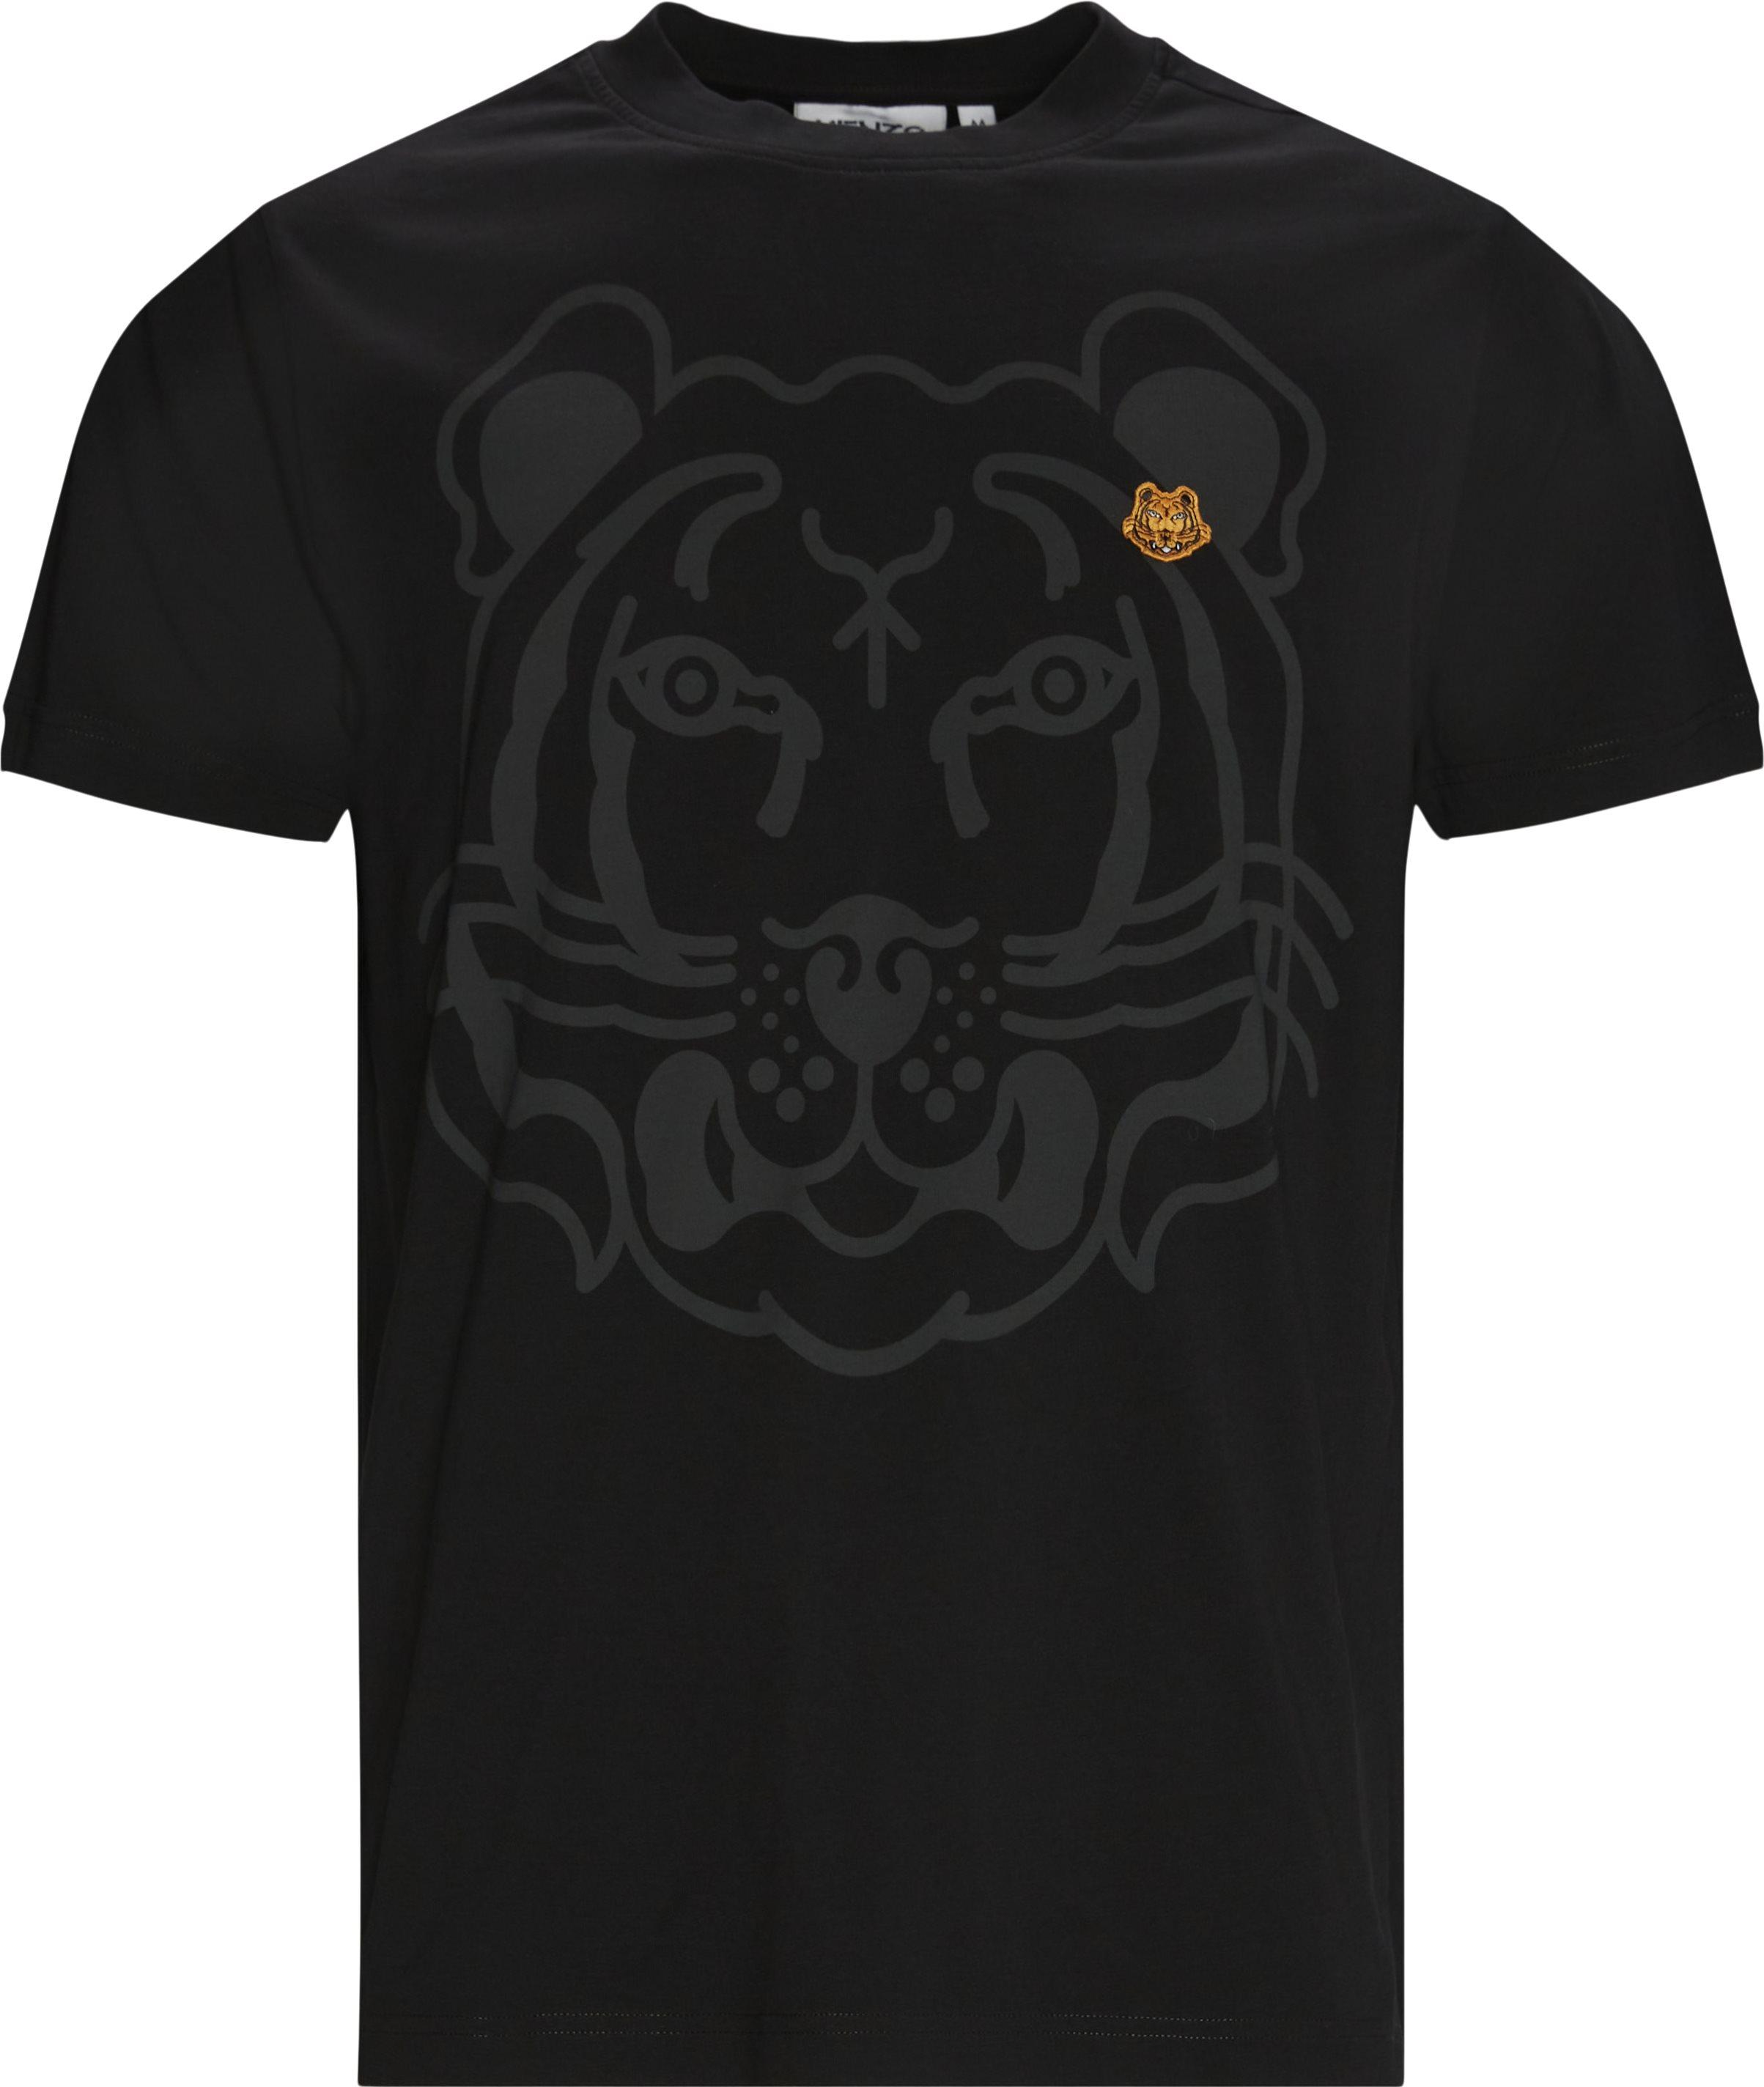 K-Tiger Tee - T-shirts - Oversize fit - Sort